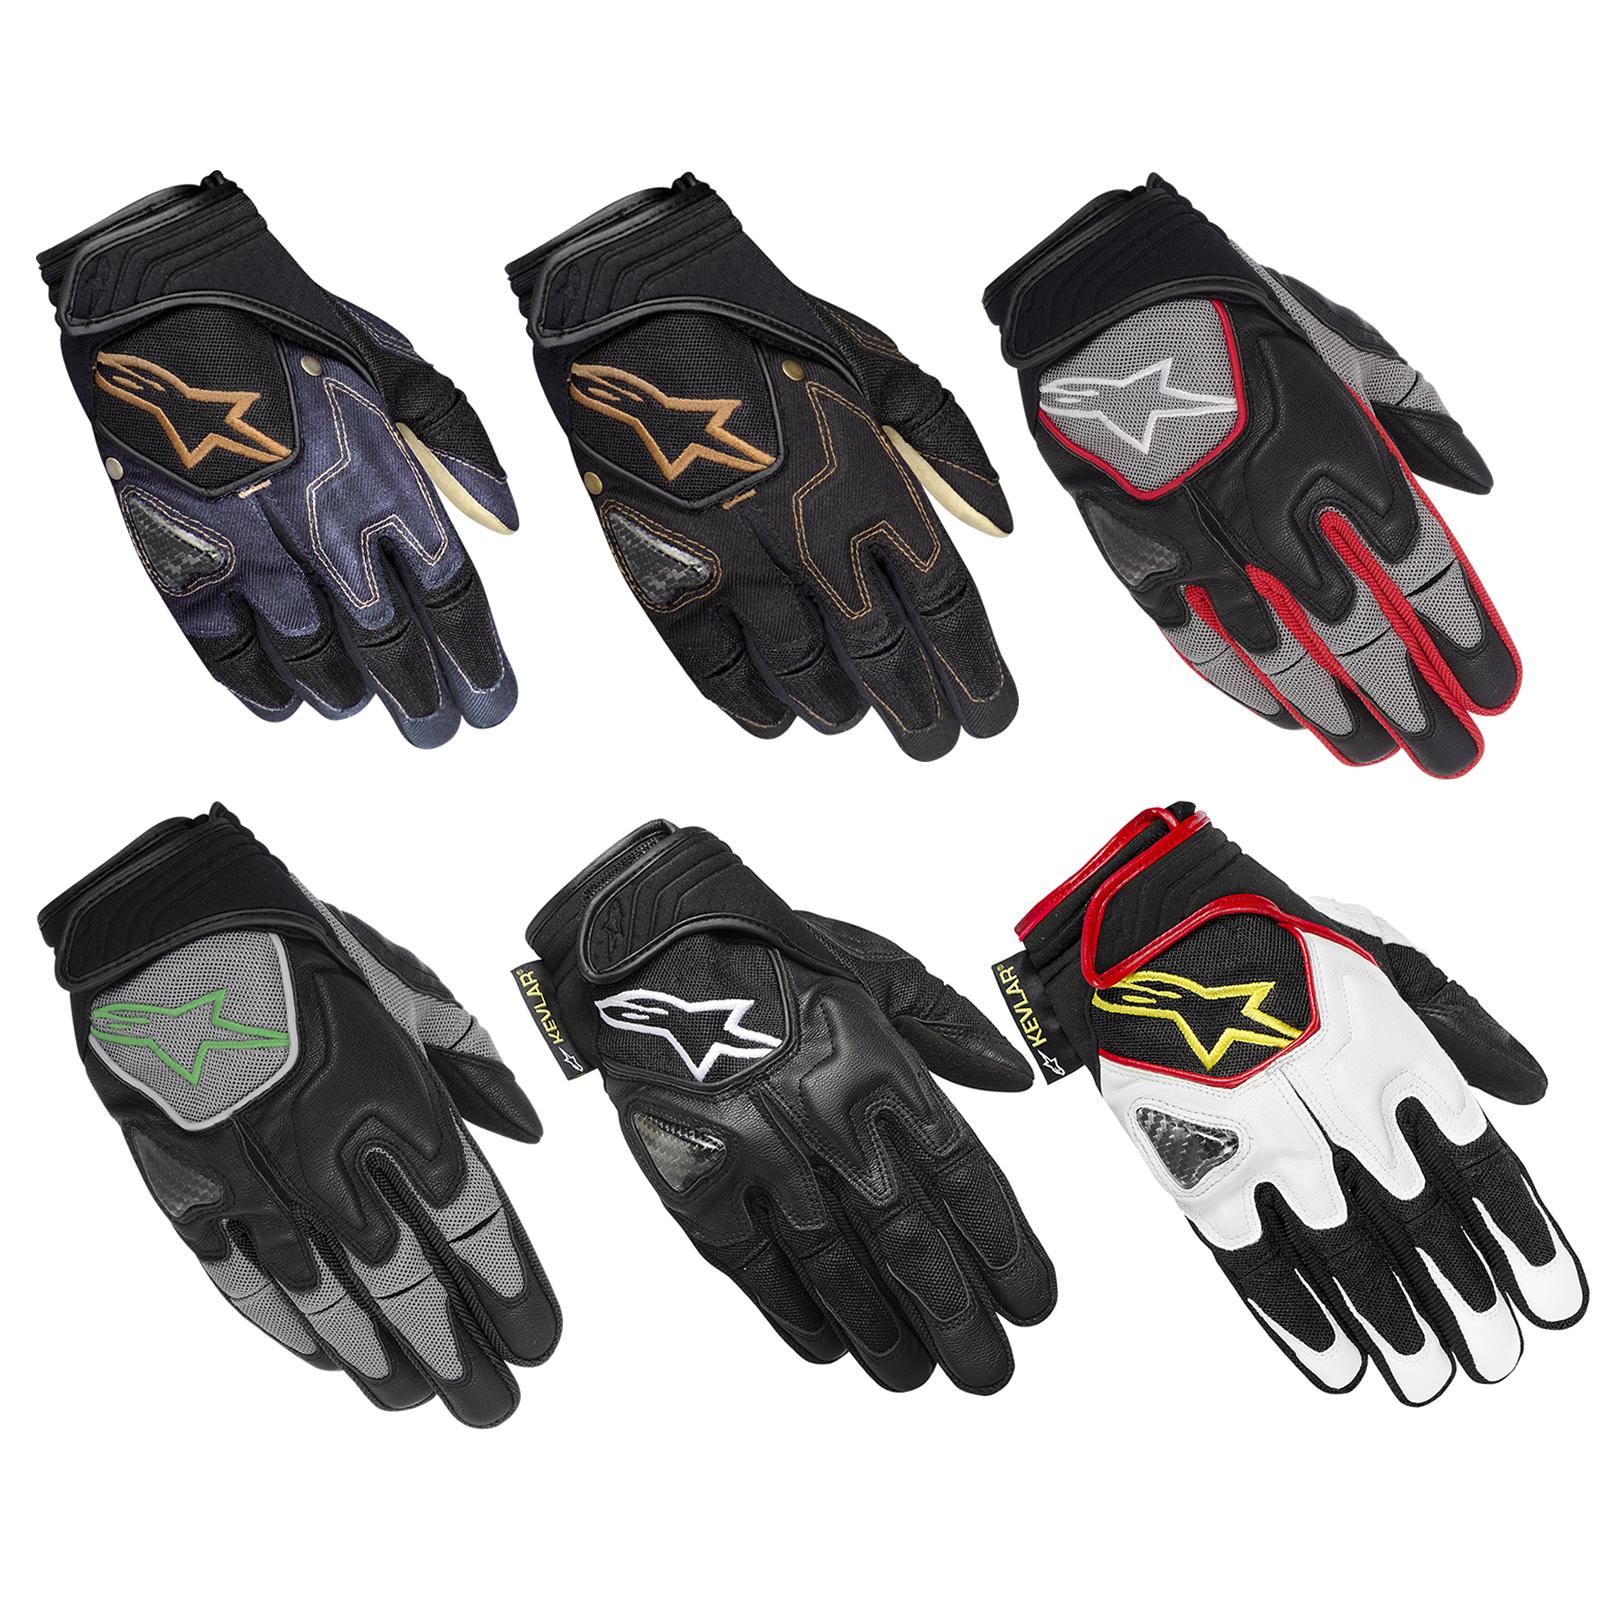 Motorcycle gloves for summer - Alpinestars Scheme Kevlar Motorcycle Short Motorbike Summer